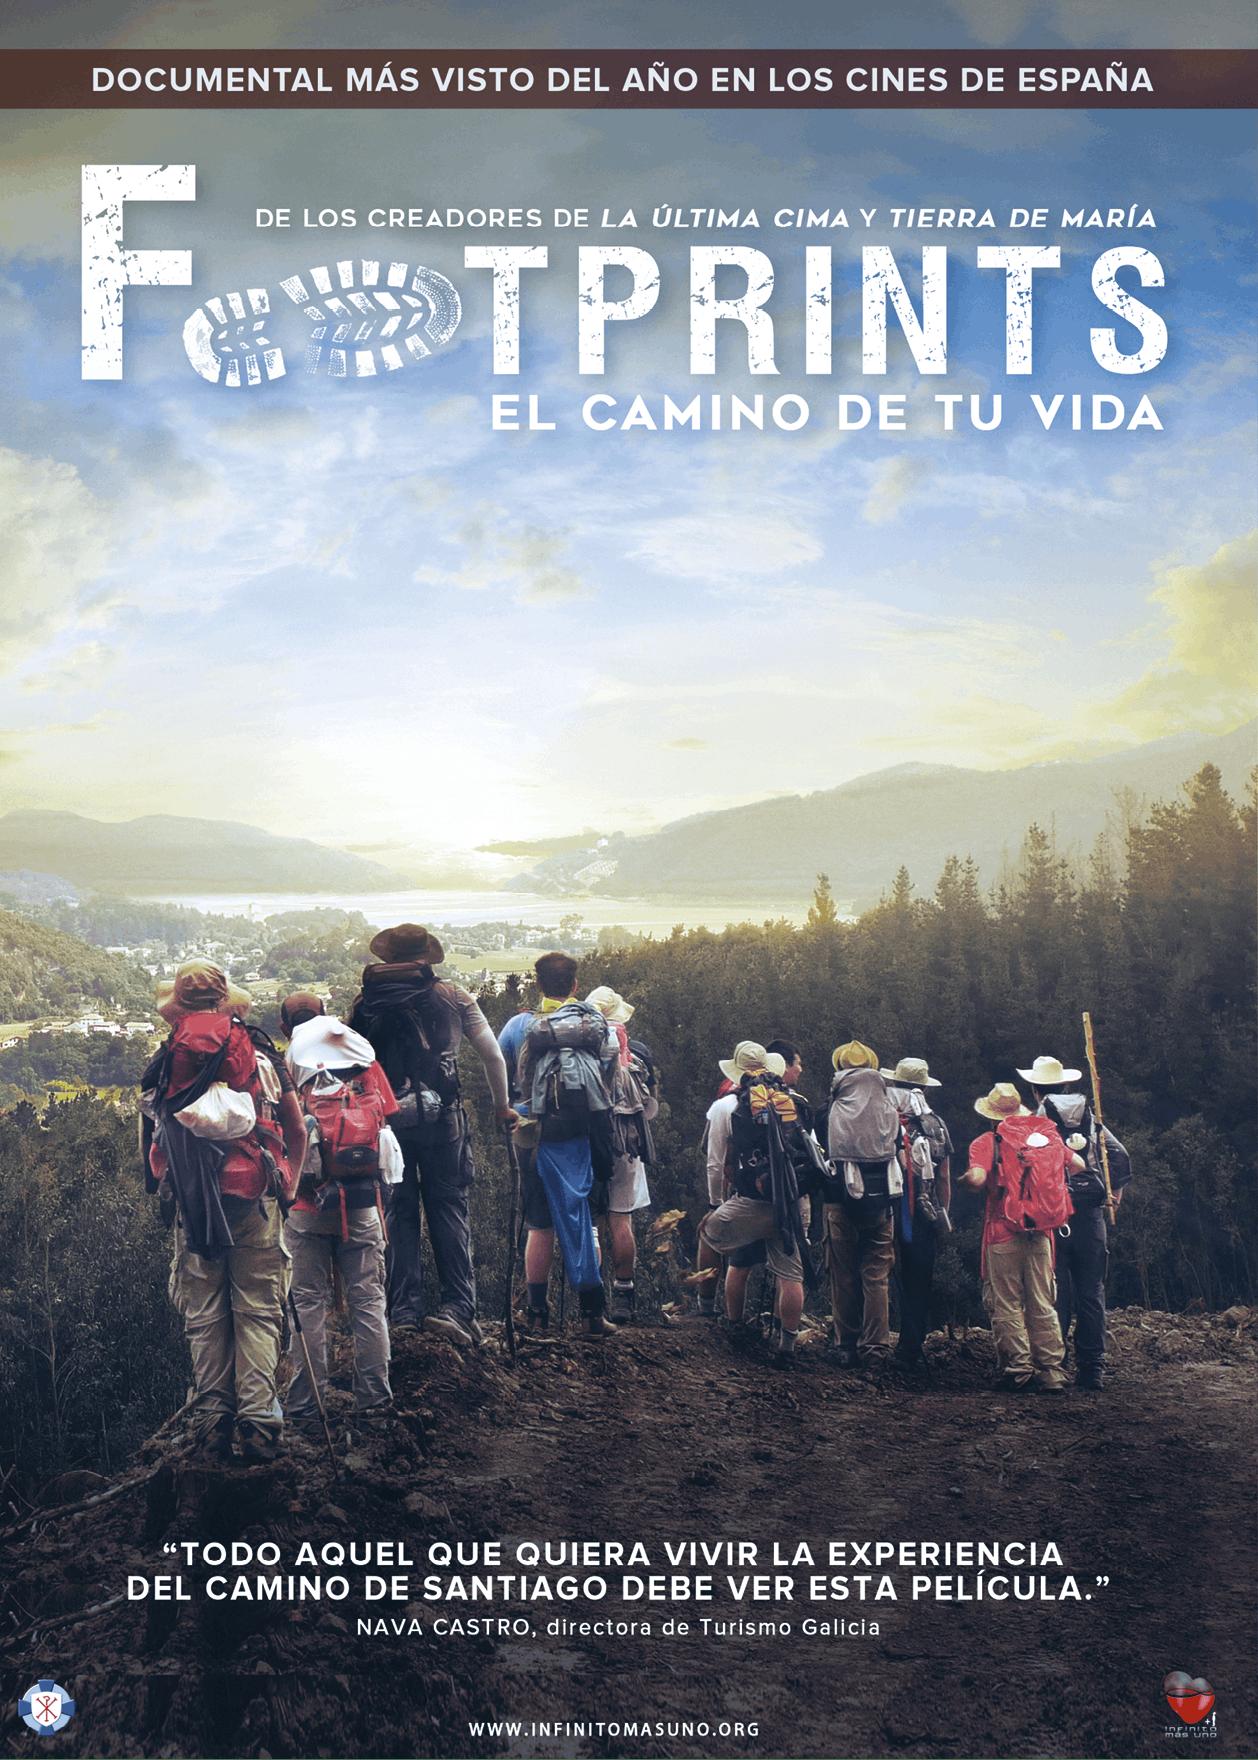 Cartel del documental Footprints, Juan Manuel Cotelo, 2016